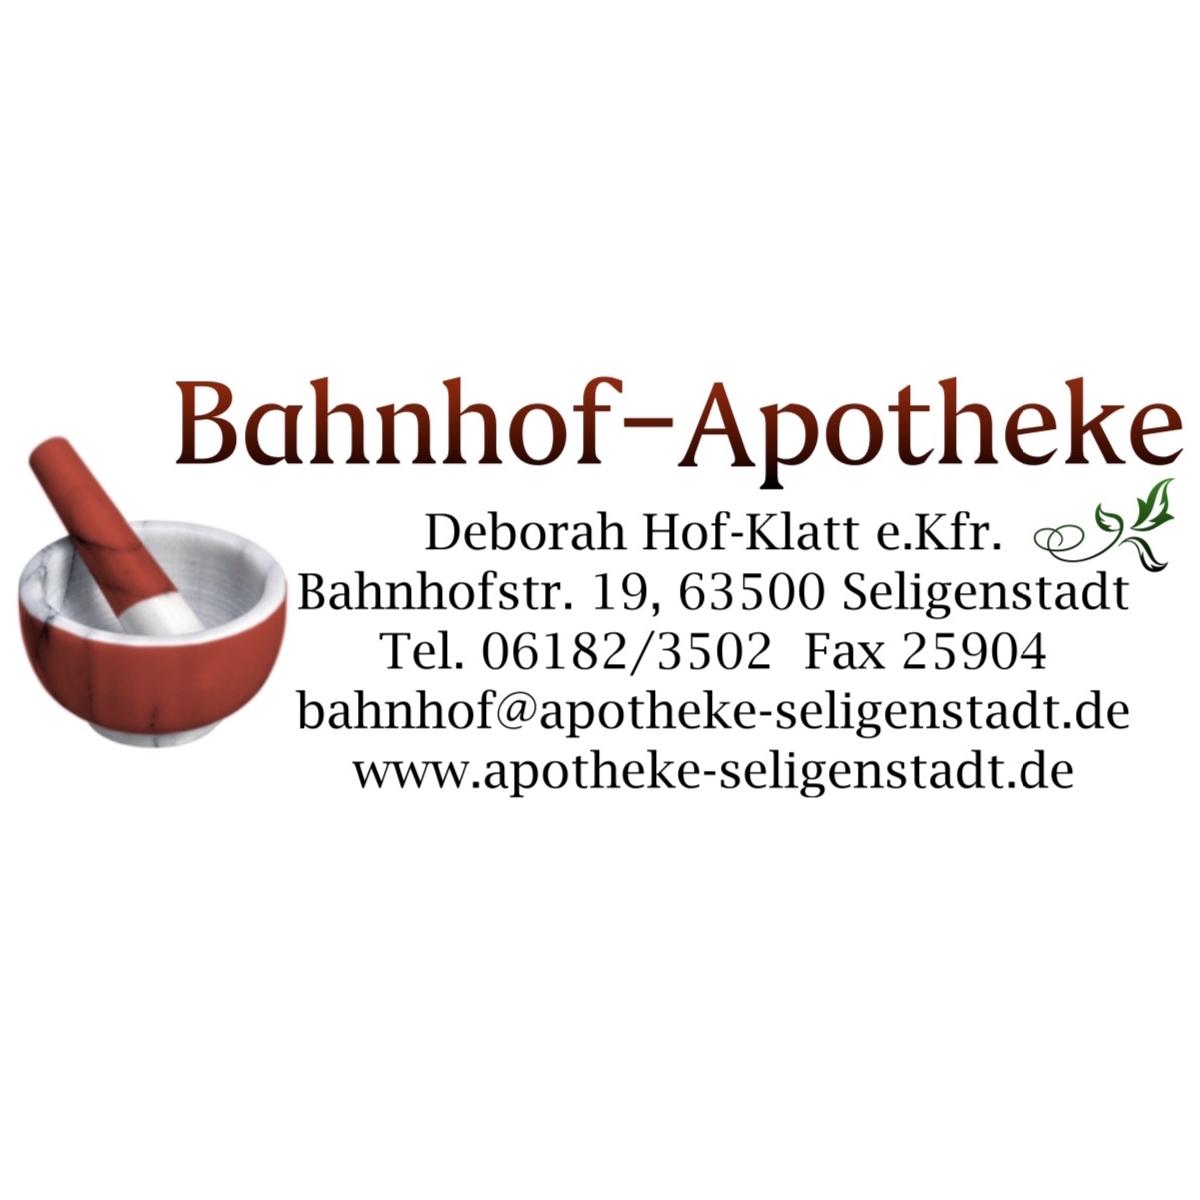 Bild zu Bahnhof-Apotheke in Seligenstadt